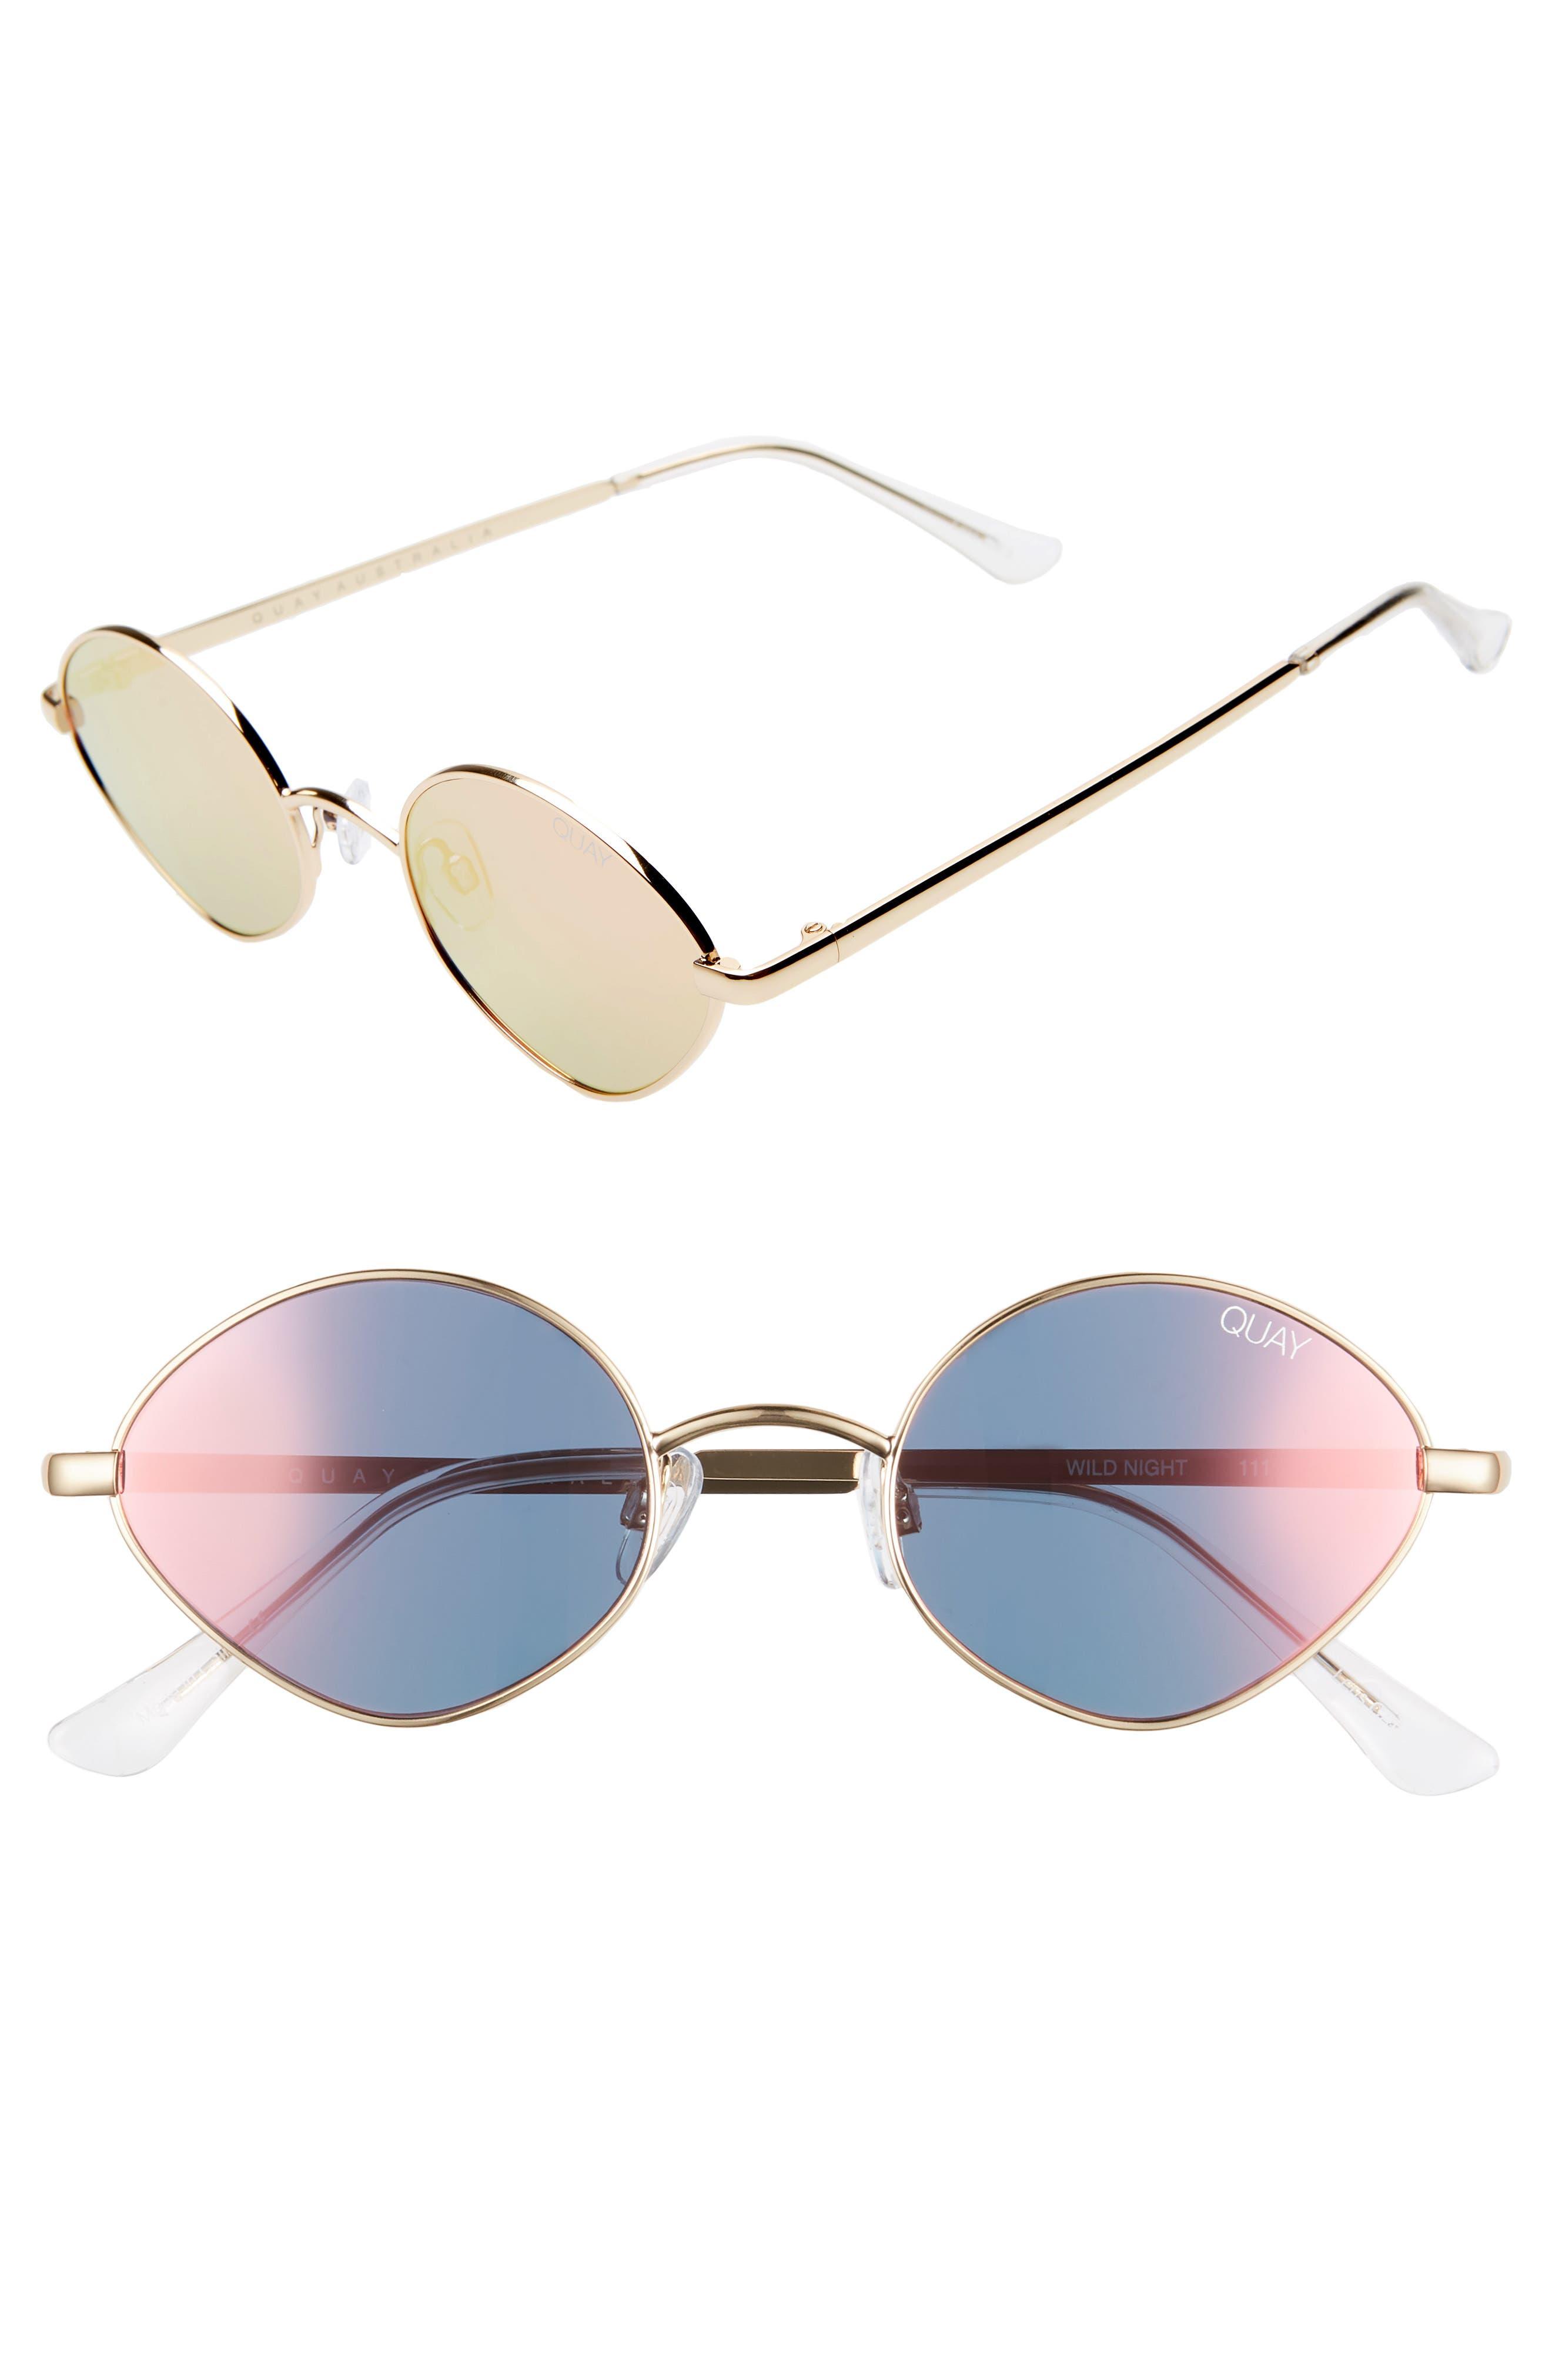 cfe77ecc96f09 Quay Australia Wild Night 55Mm Teardrop Sunglasses - Gold  Peach Pink